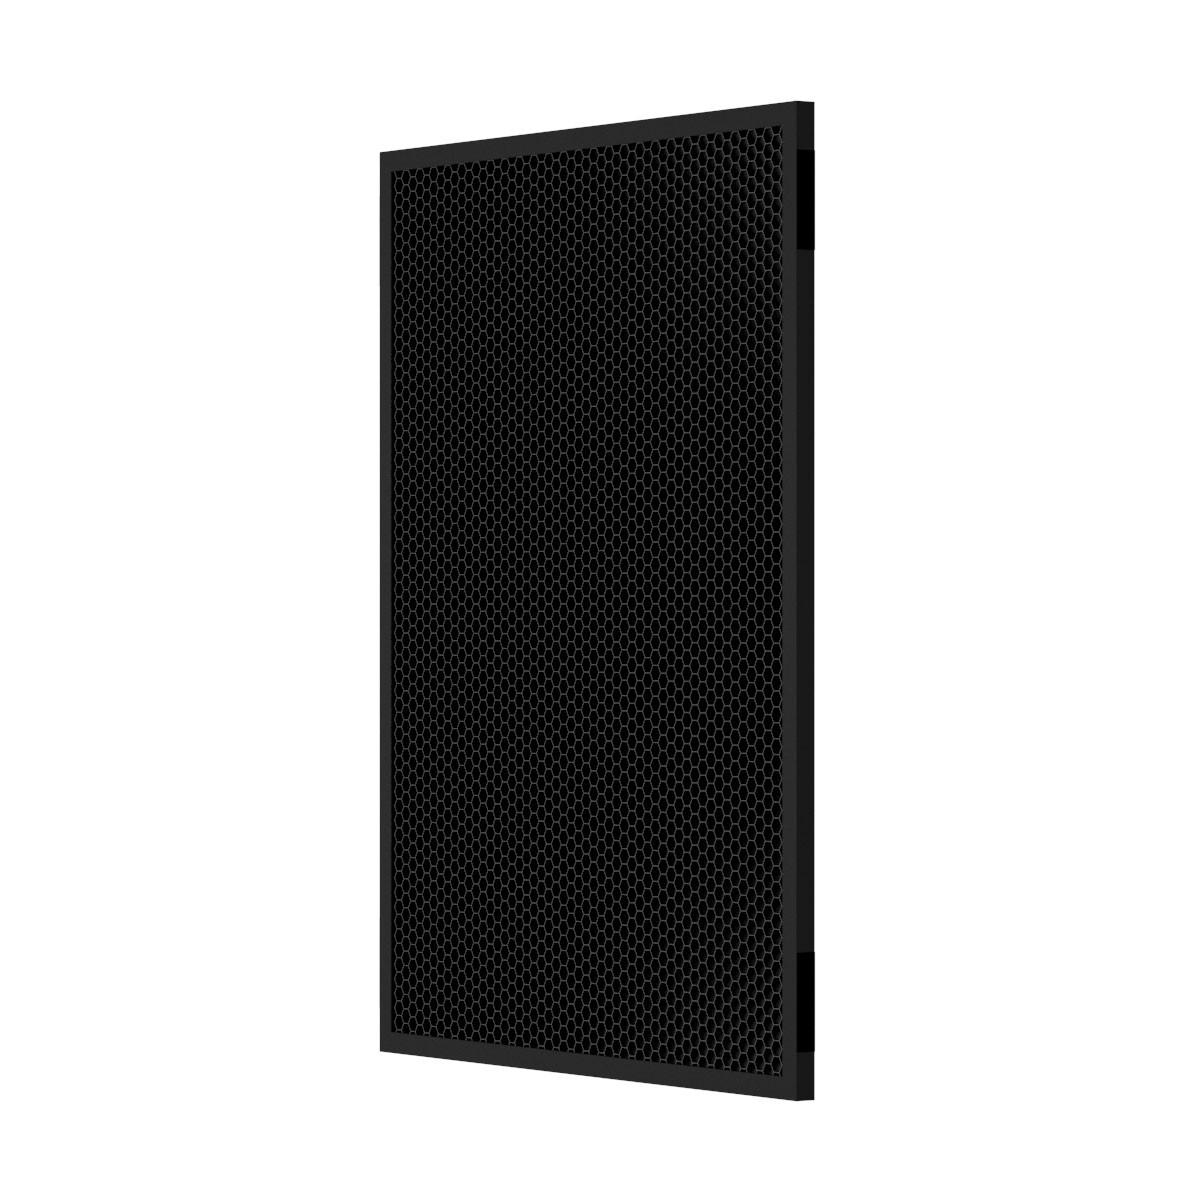 Colmeia para softbox spot 60 x 80